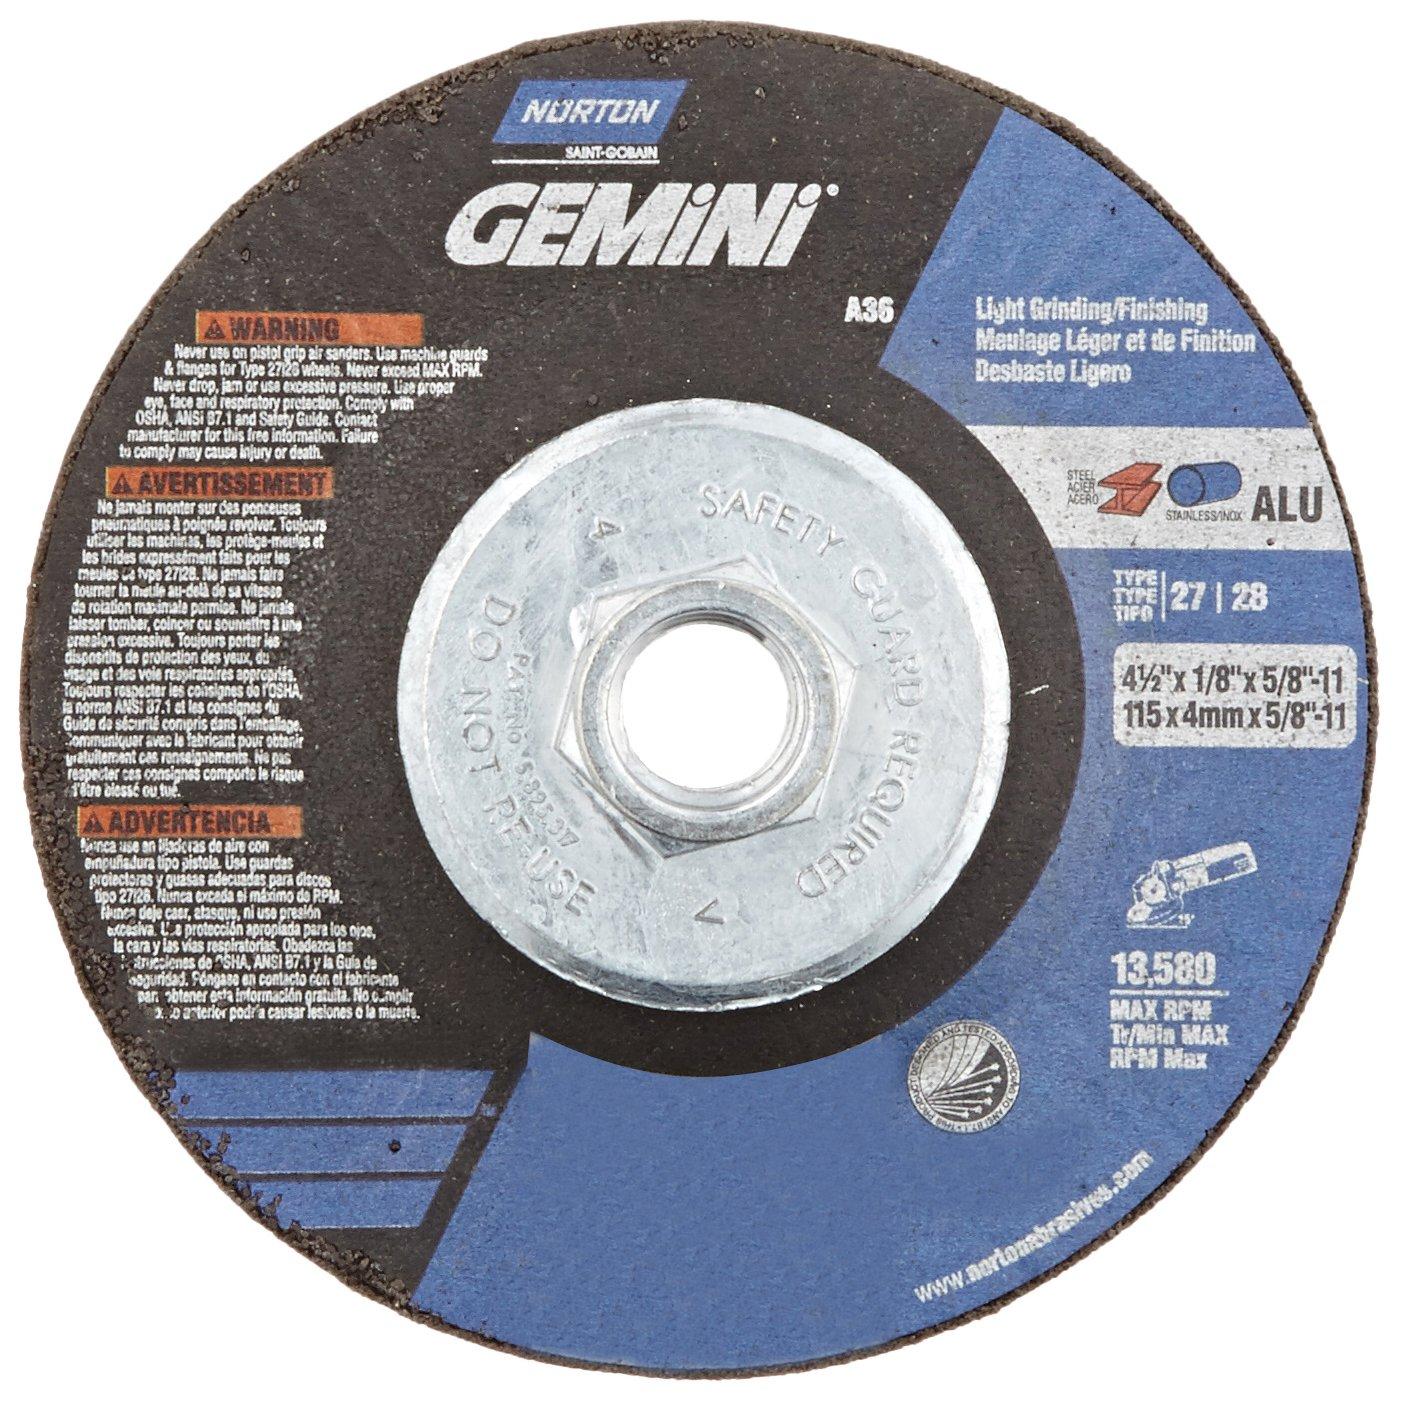 Type 29 5//8-11 Hub Norton Charger Flex Depressed Center Abrasive Wheel Aluminum Oxide 4-1//2 Diameter x 1//8 Thickness Gobain 66252842203 Pack of 10 Grit 36 5//8-11 Hub 4-1//2 Diameter x 1//8 Thickness St